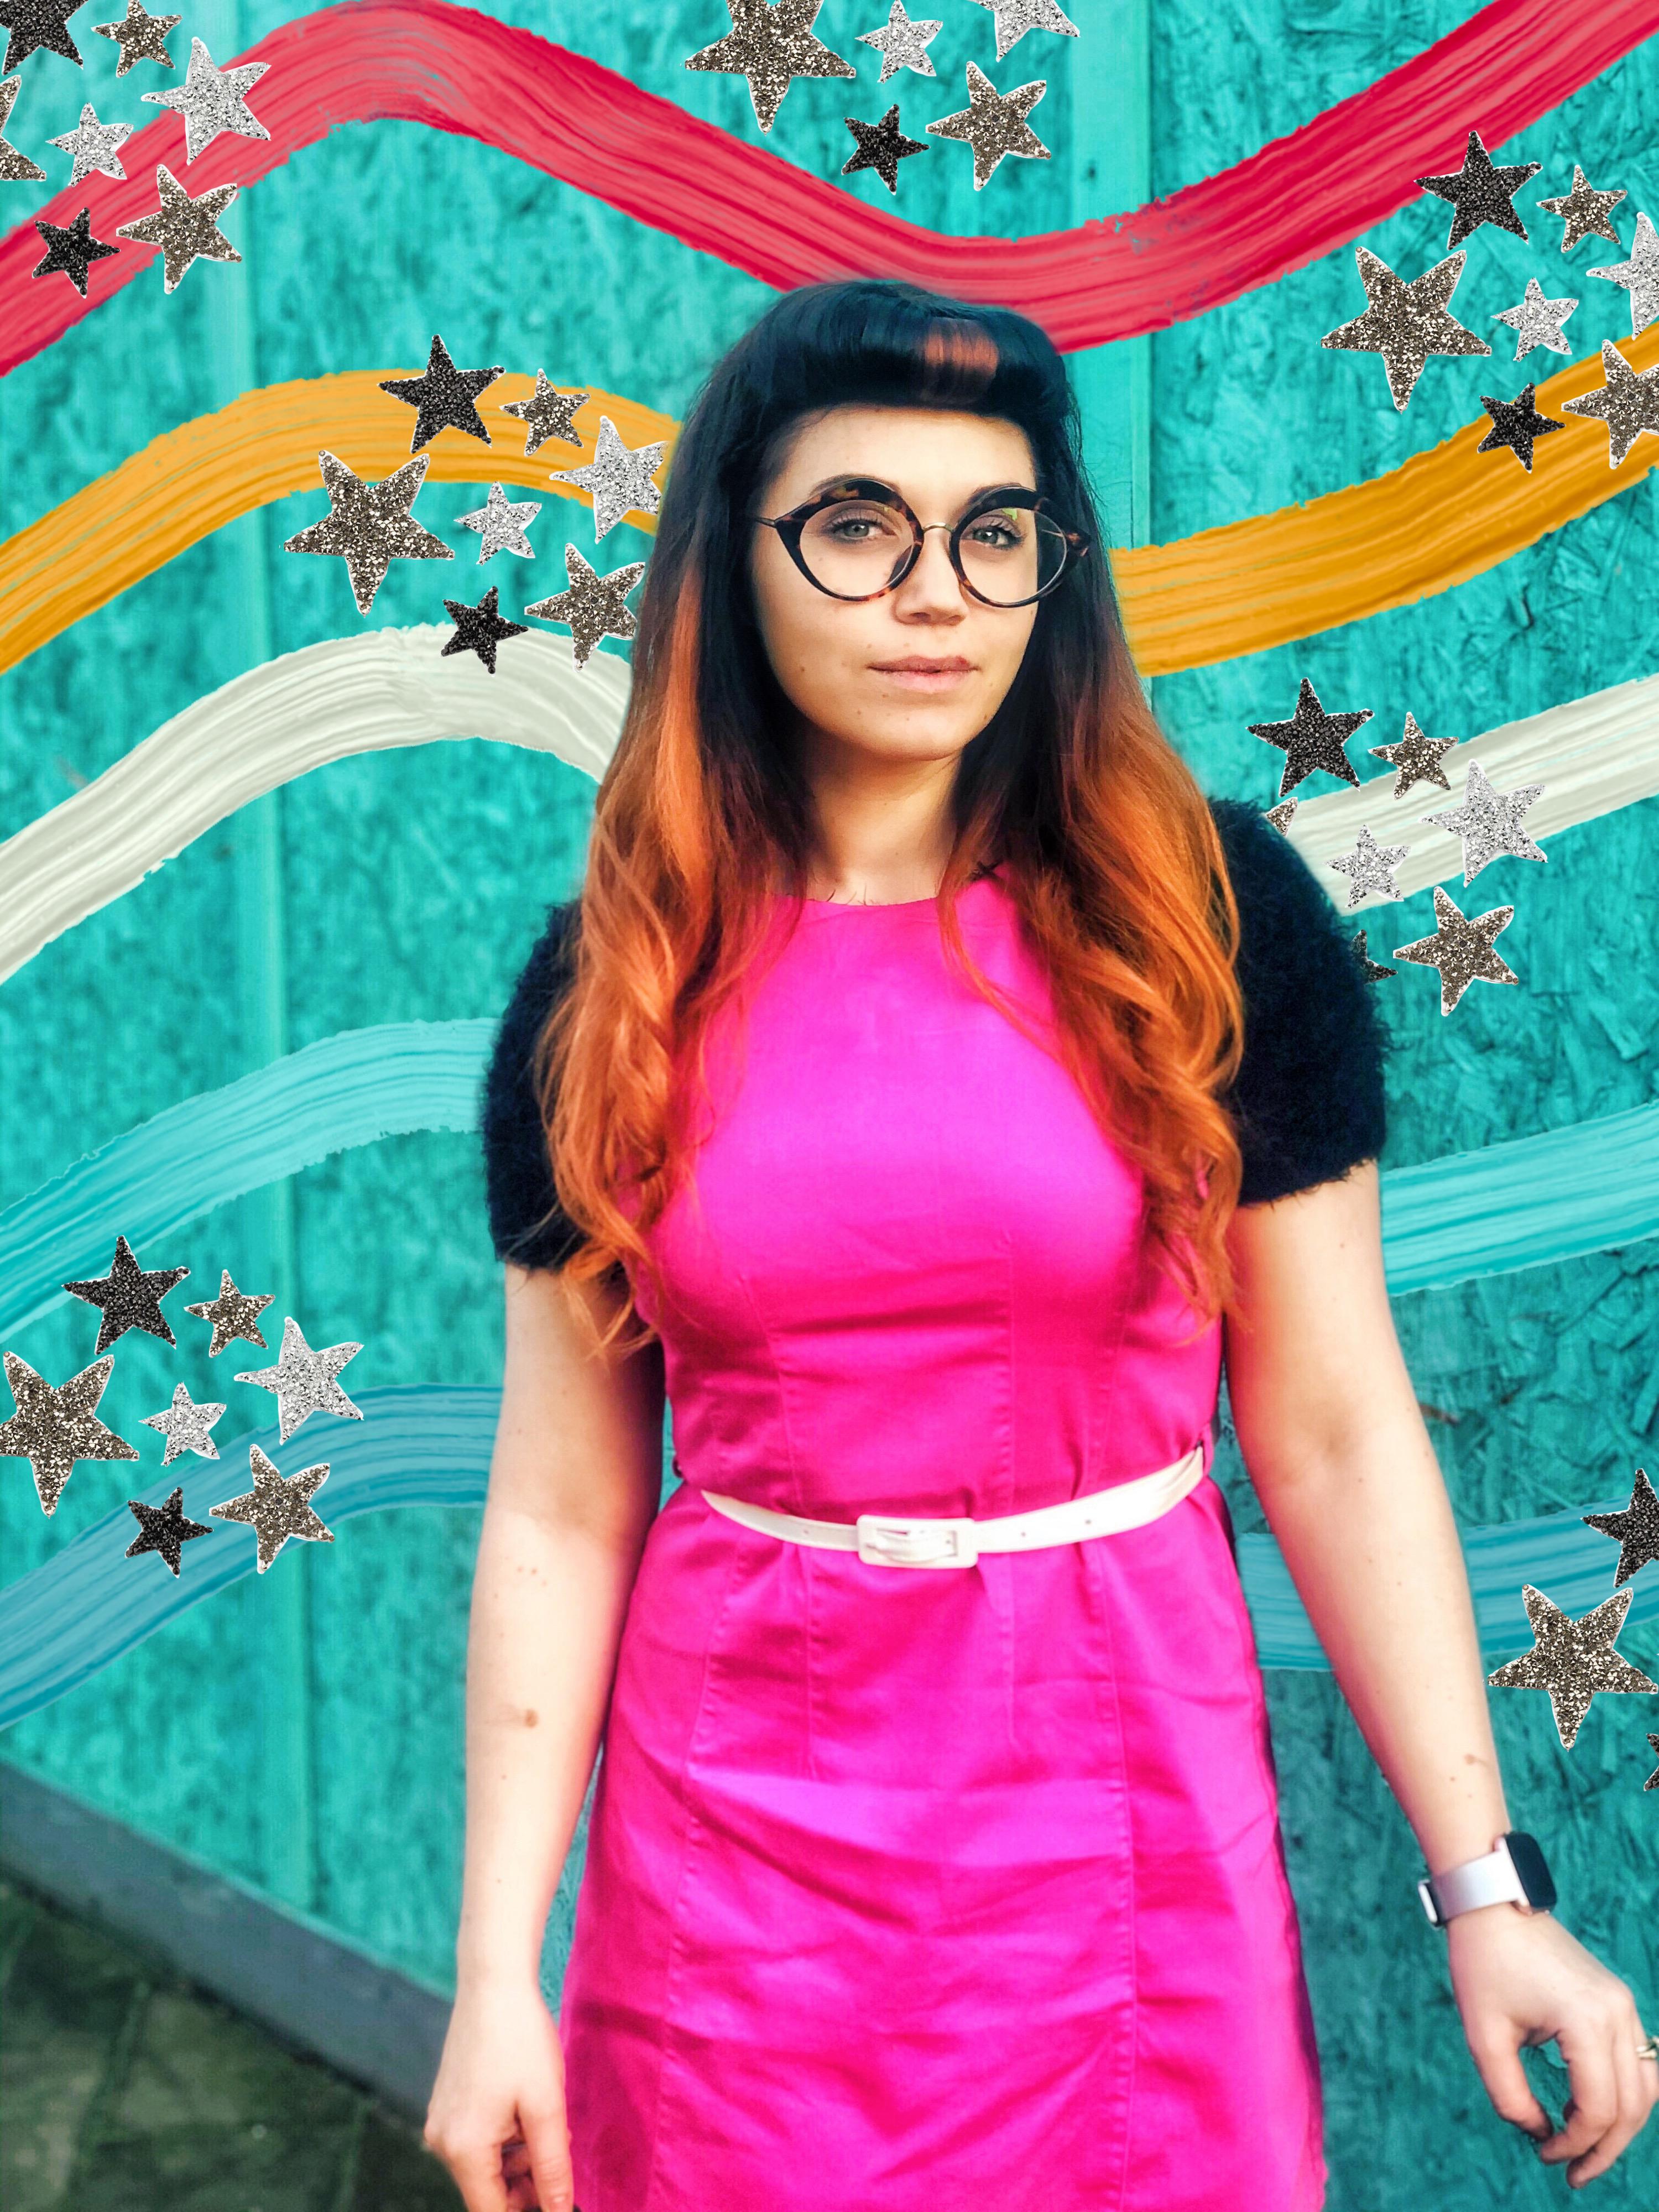 Cerise Pink Dress